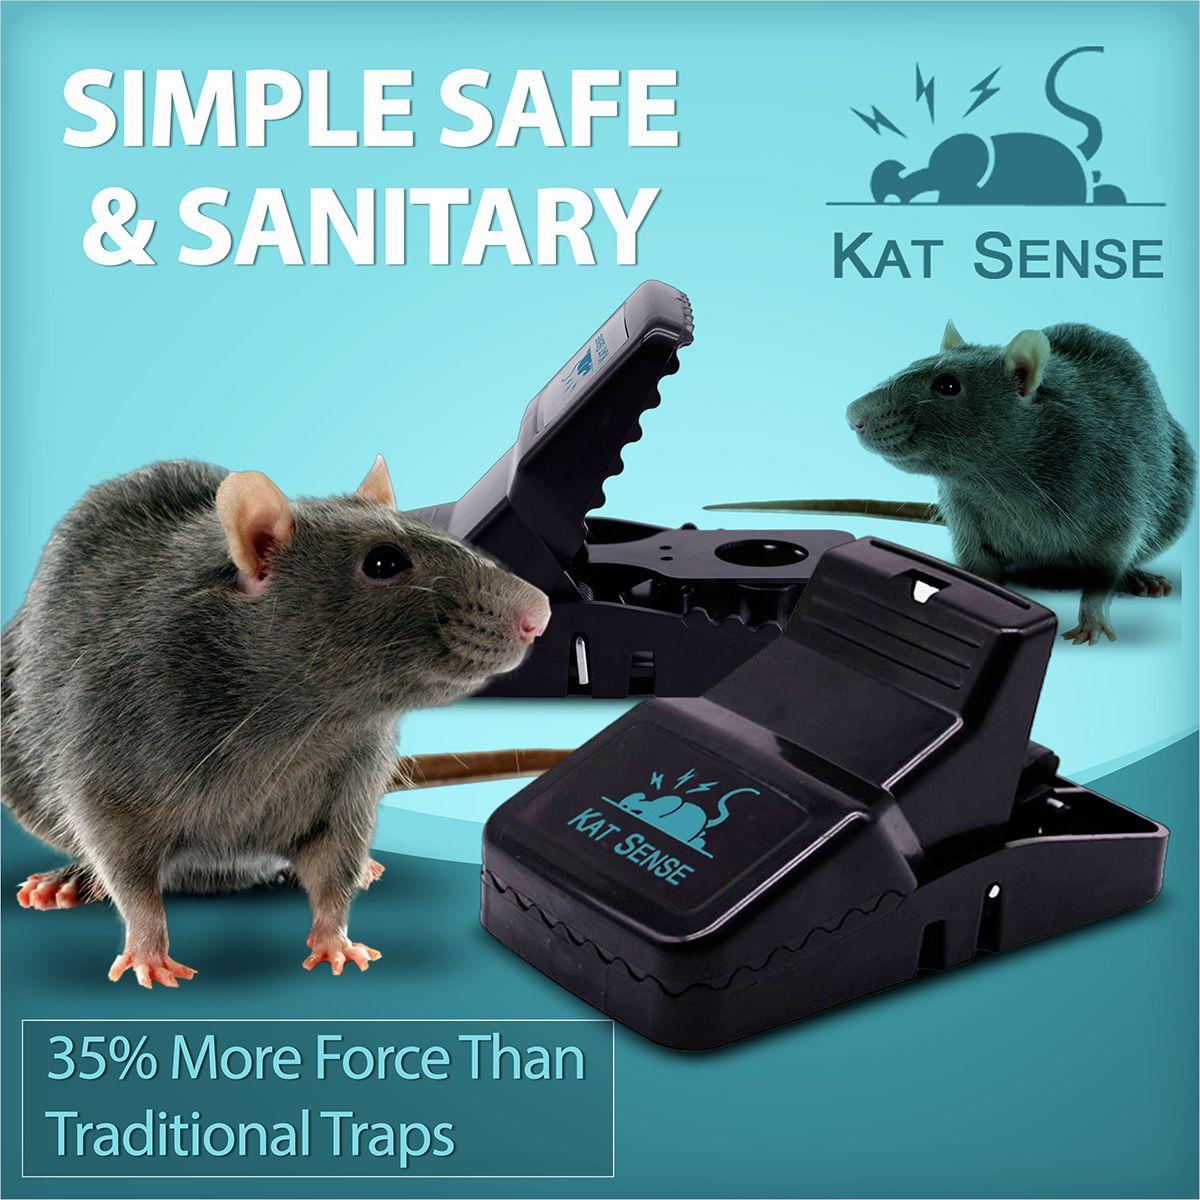 100 RAT KILL RATE NO ESCAPE about false